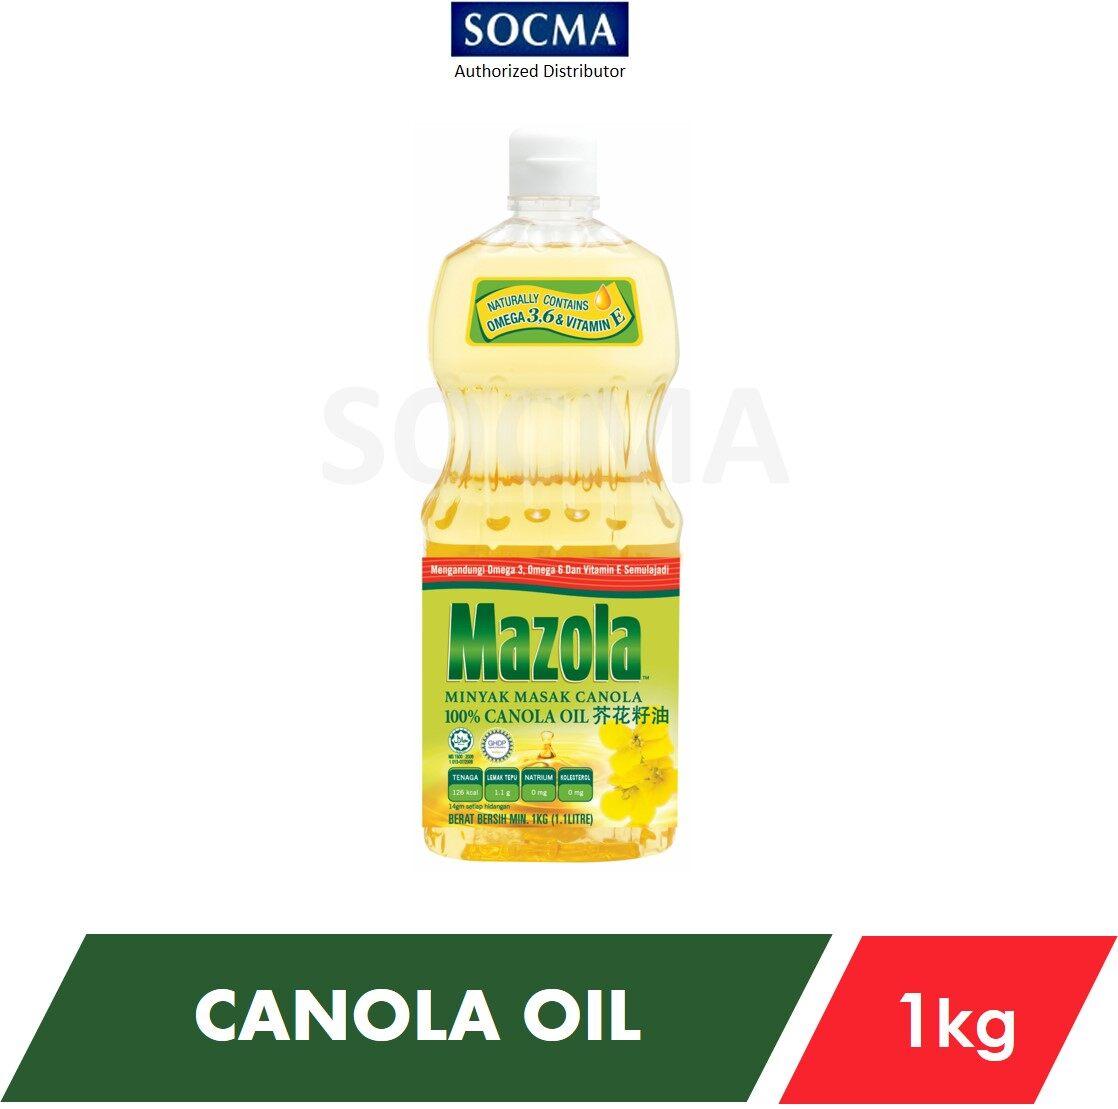 Mazola Canola Oil 1kg [1]